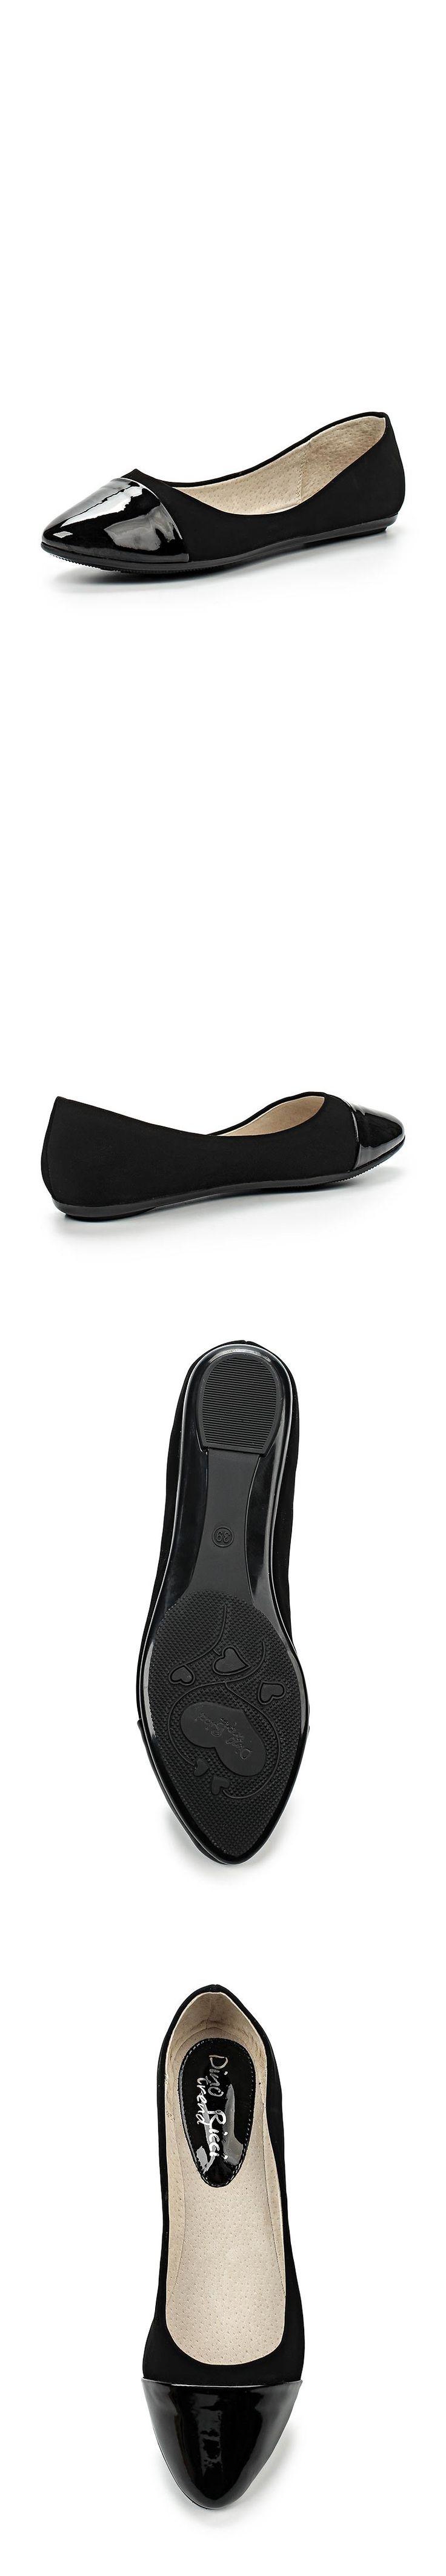 Женская обувь балетки Dino Ricci Trend за 2799.00 руб.